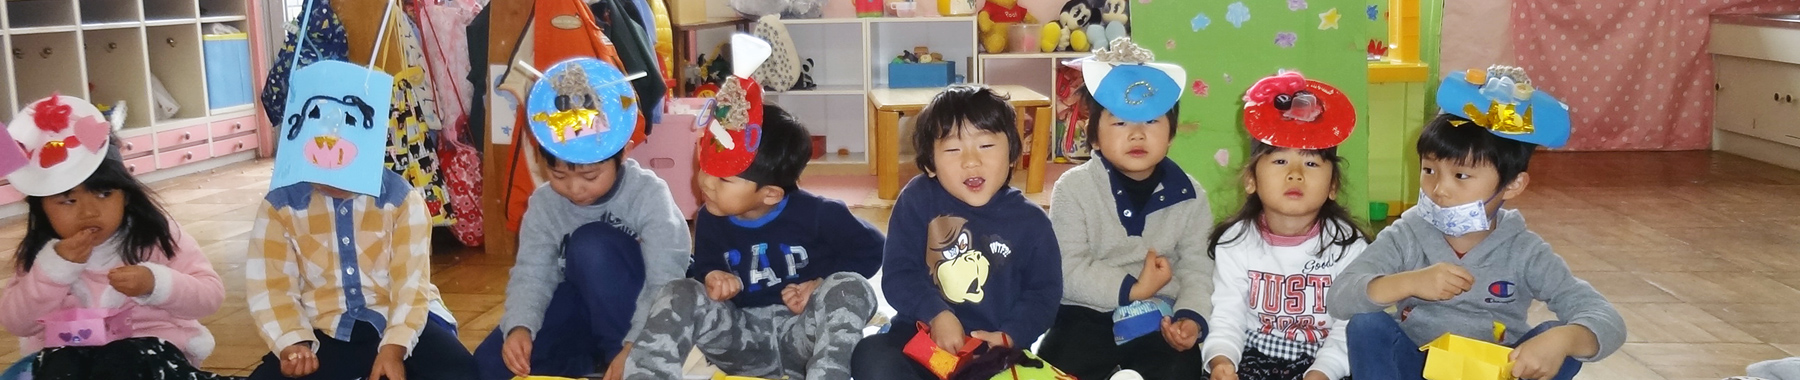 埼玉県川越市の幼稚園、学校法人根本学園かすみ幼稚園